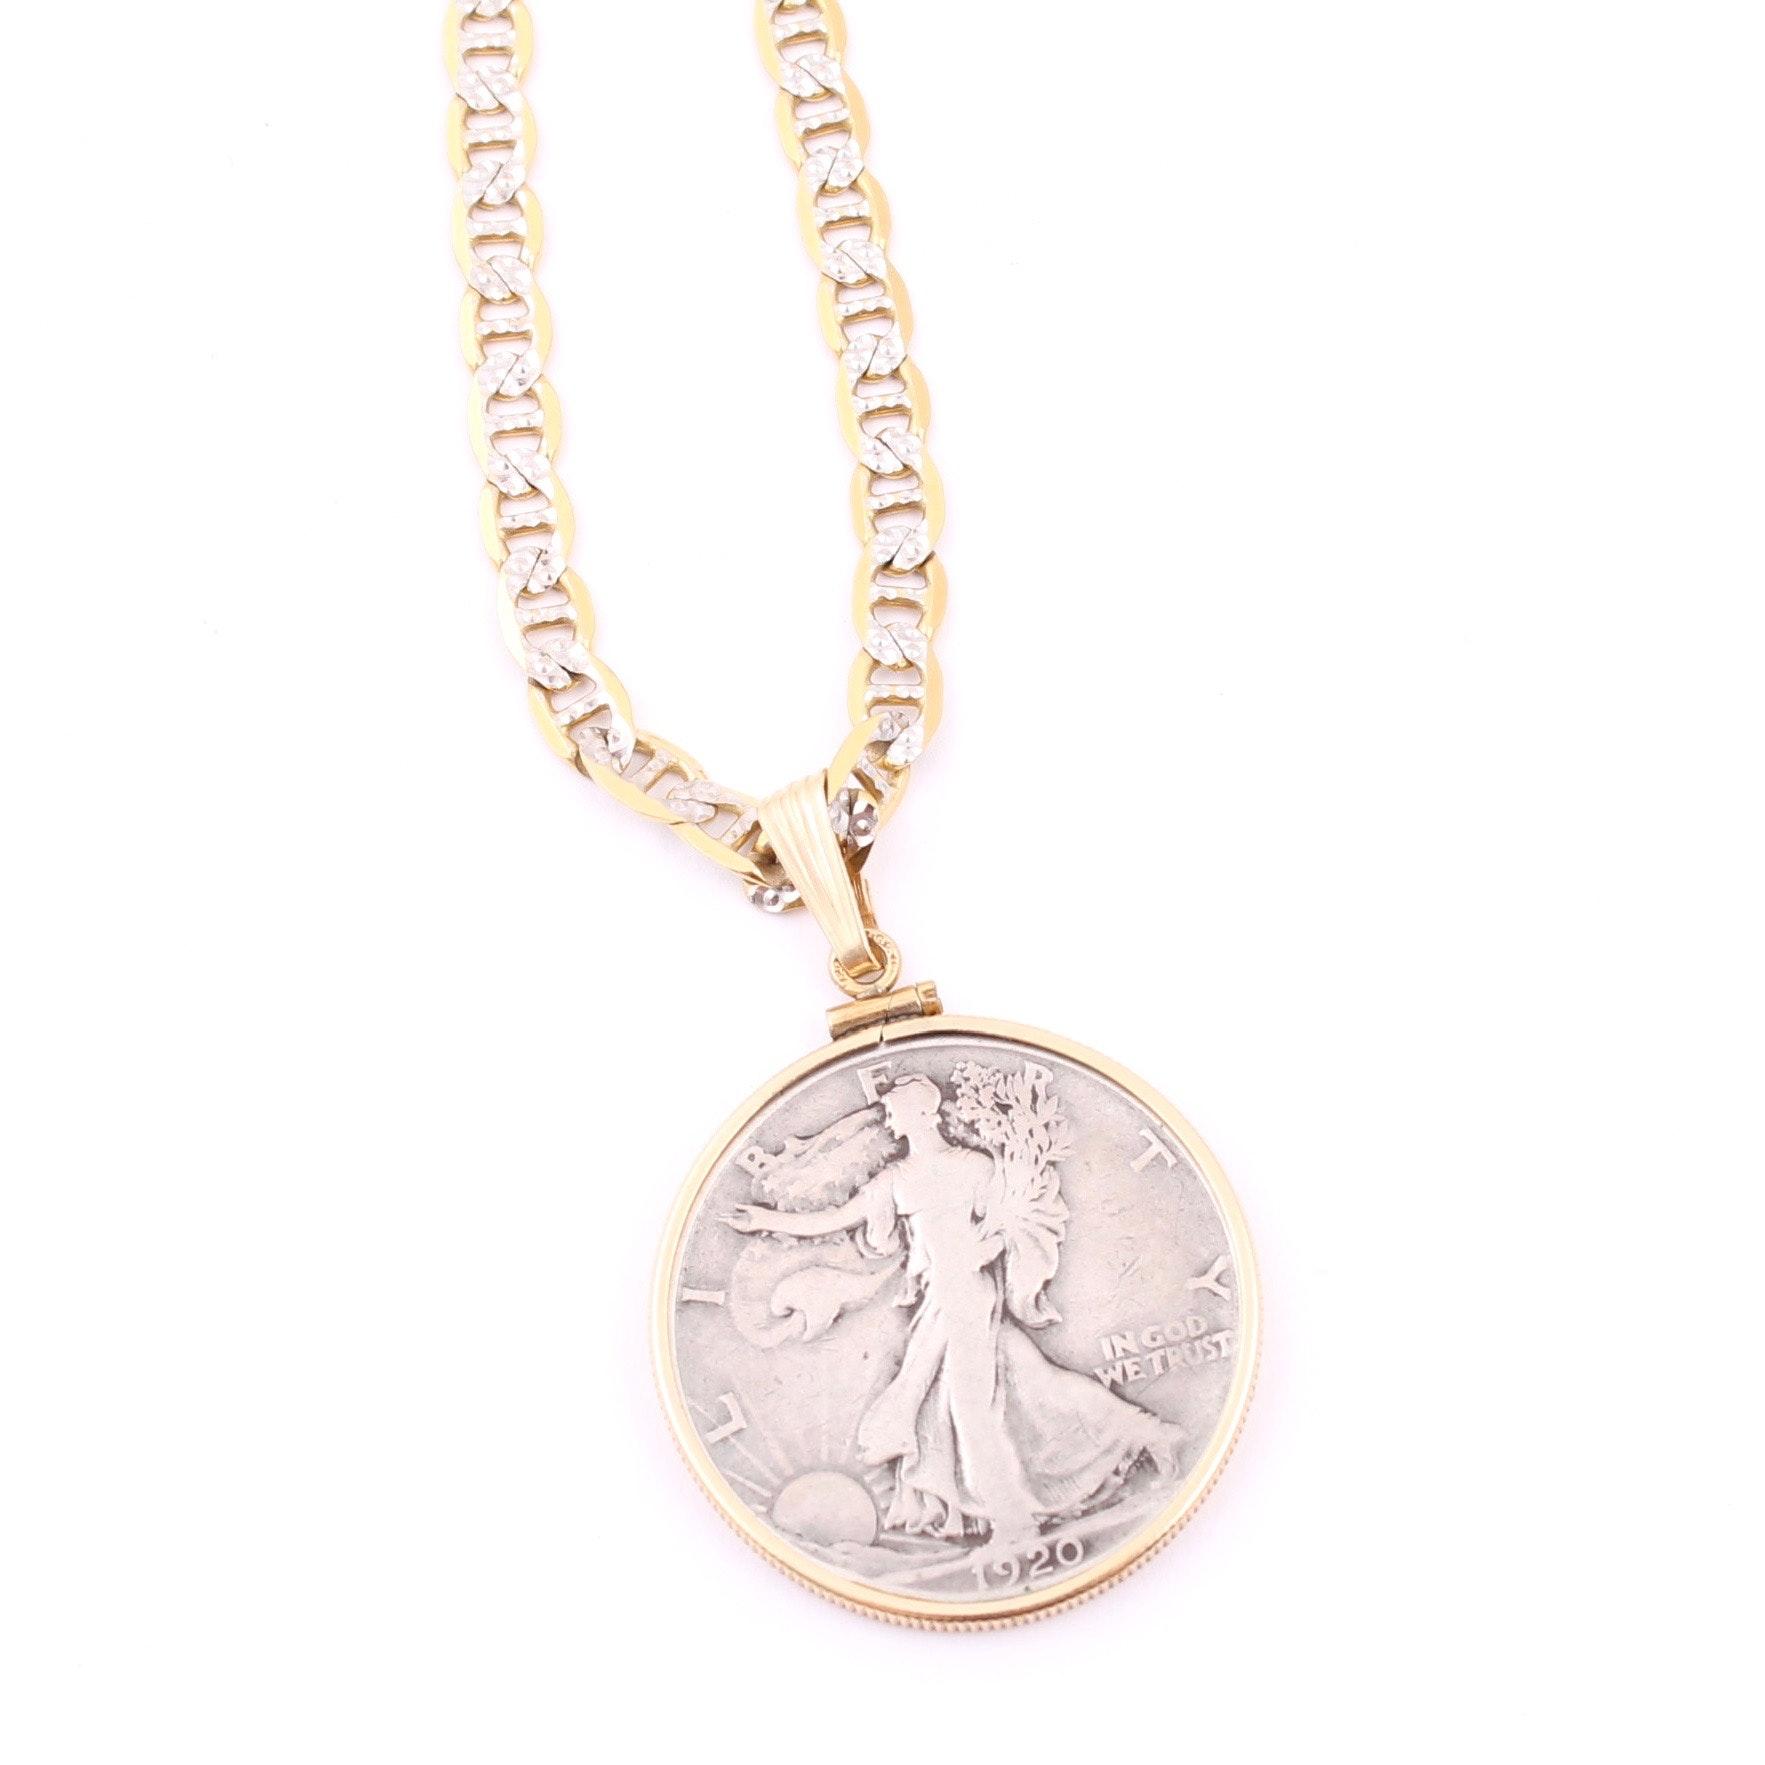 1920 Liberty Silver Half Dollar Pendant on 10K Bicolor Gold Chain